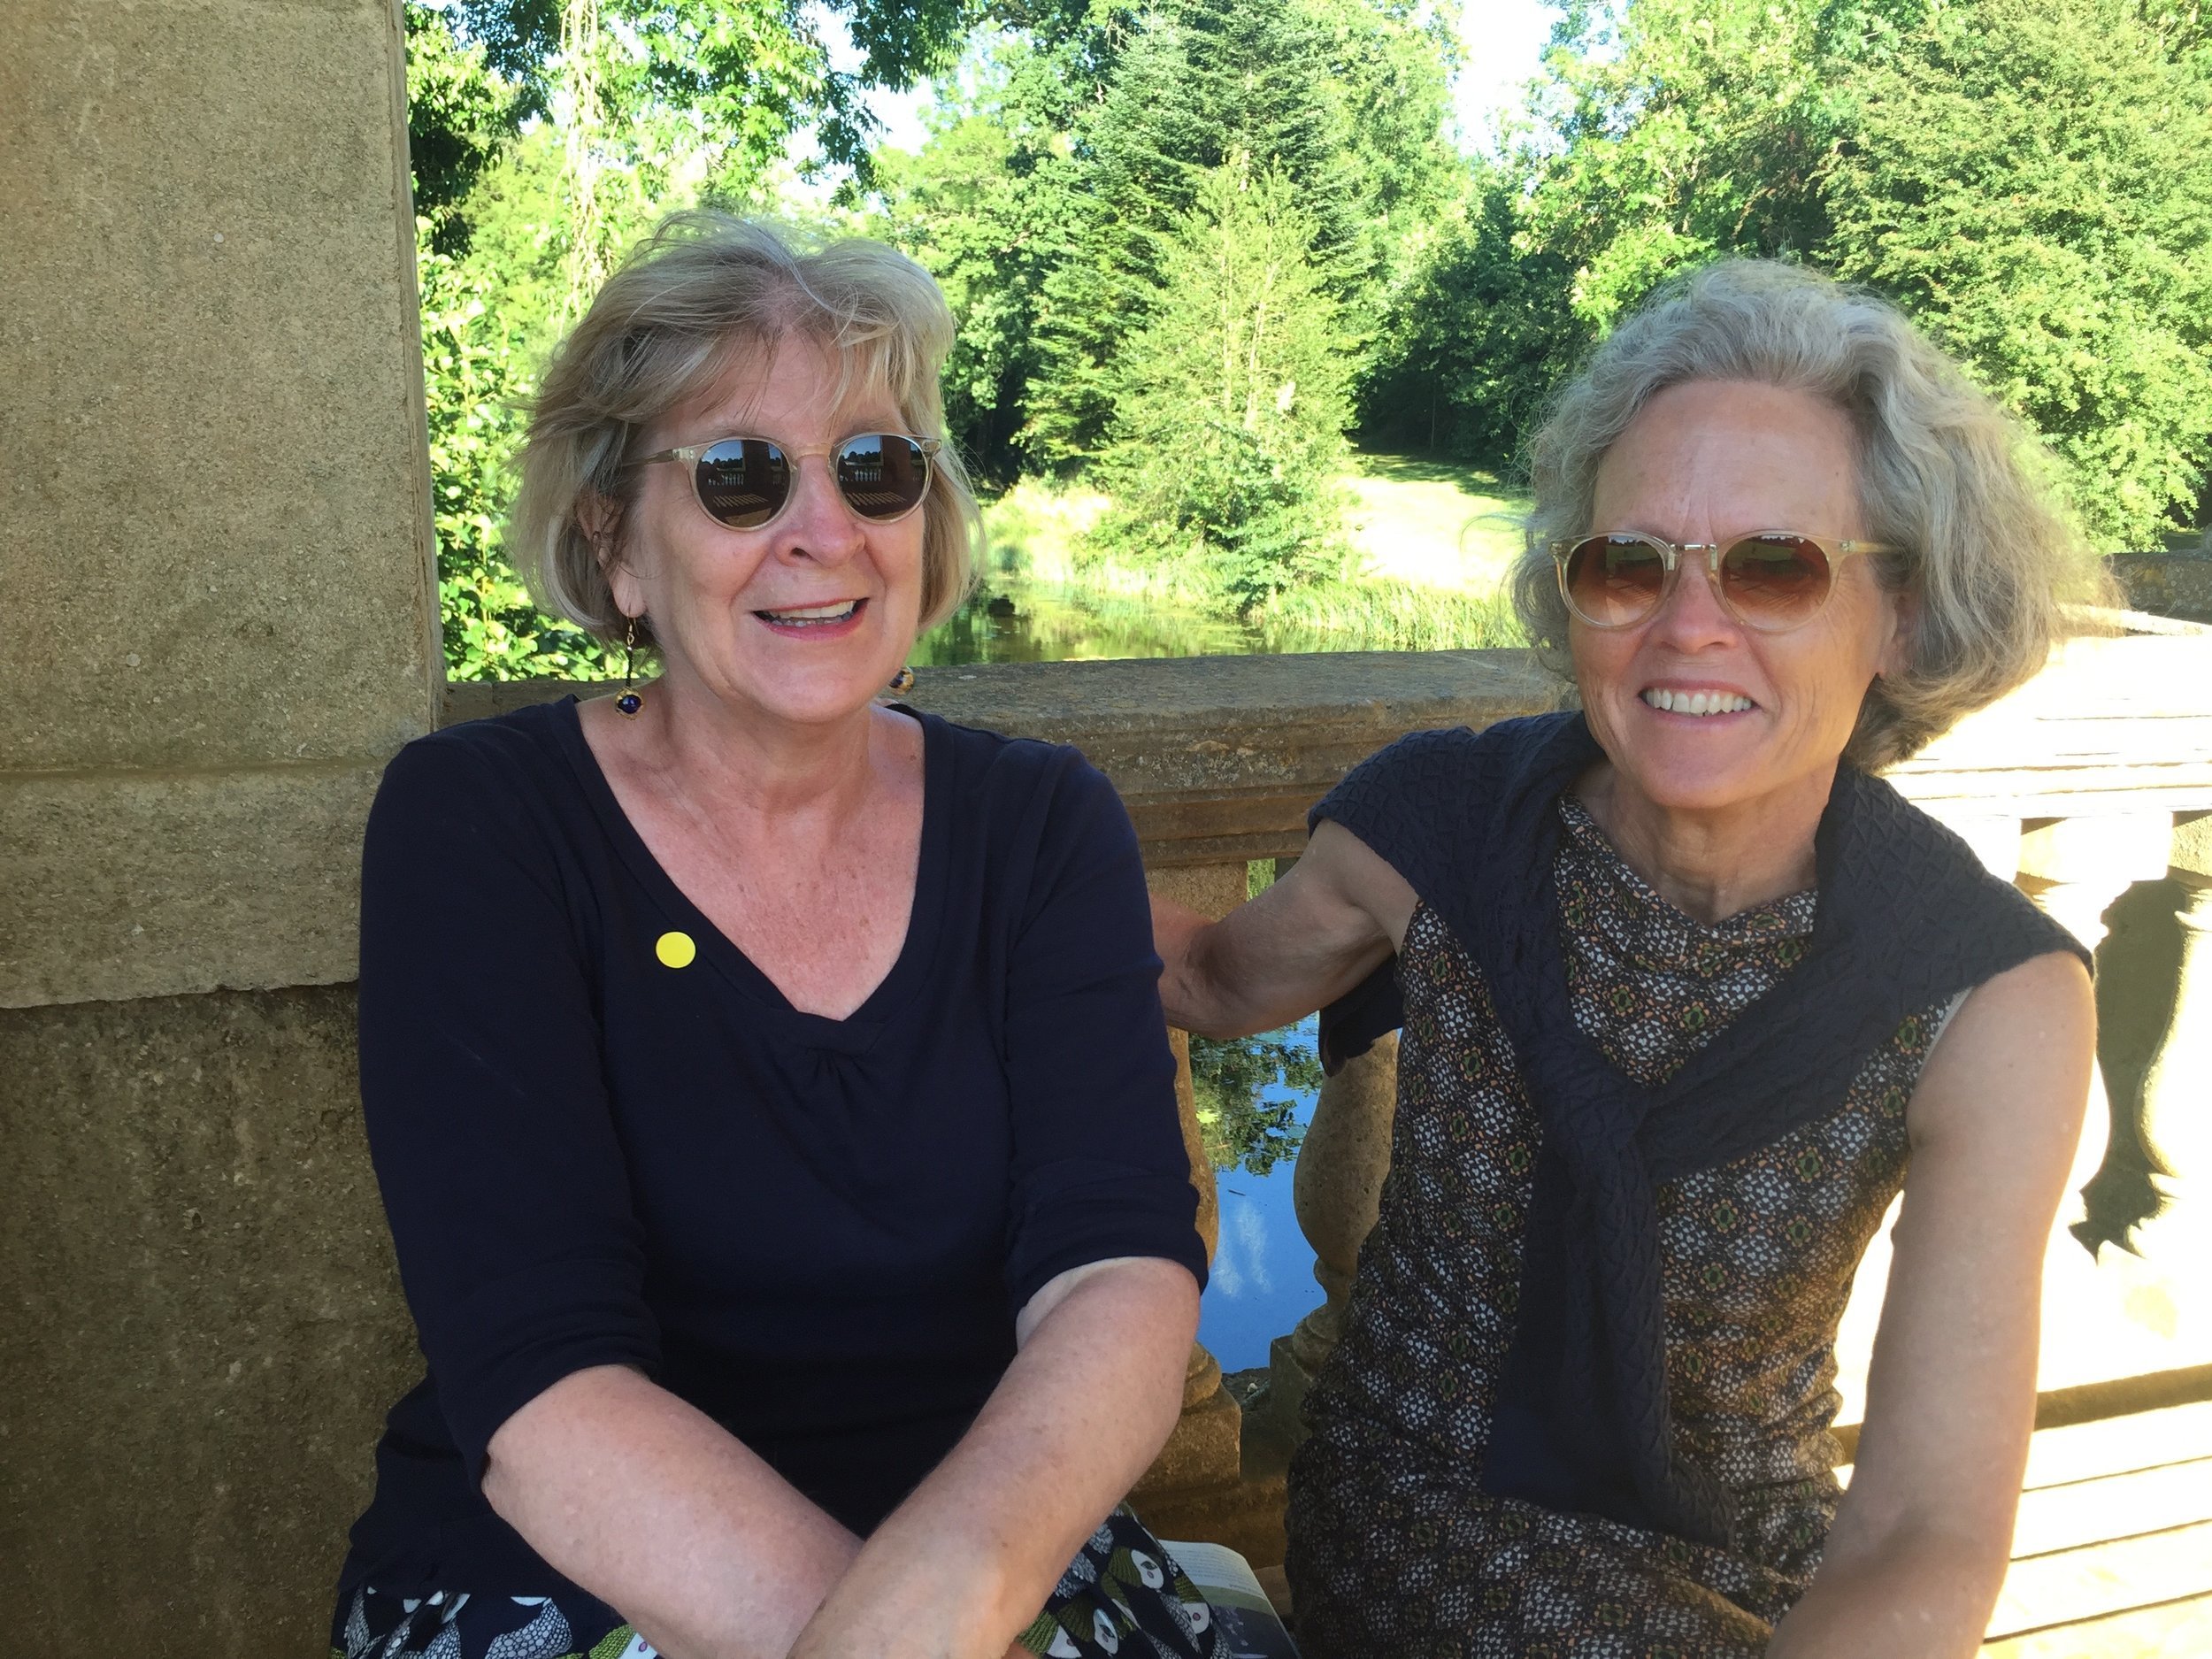 Garden Historian Nancy Leszczynski and Libby Lubin at the gardens of Stowe